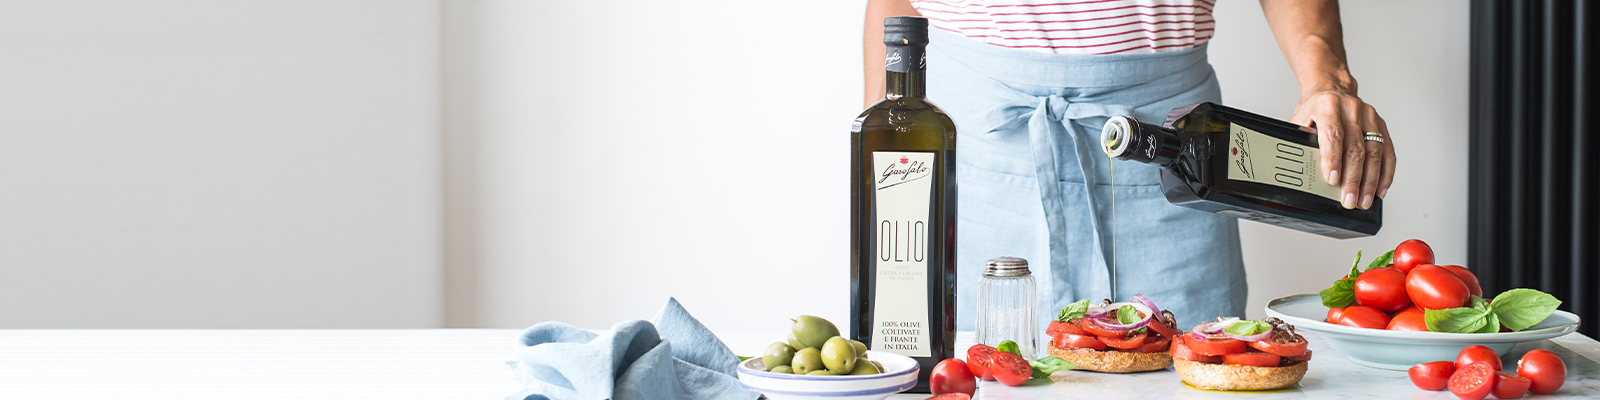 Pasta Garofalo - Extra zuivere olie